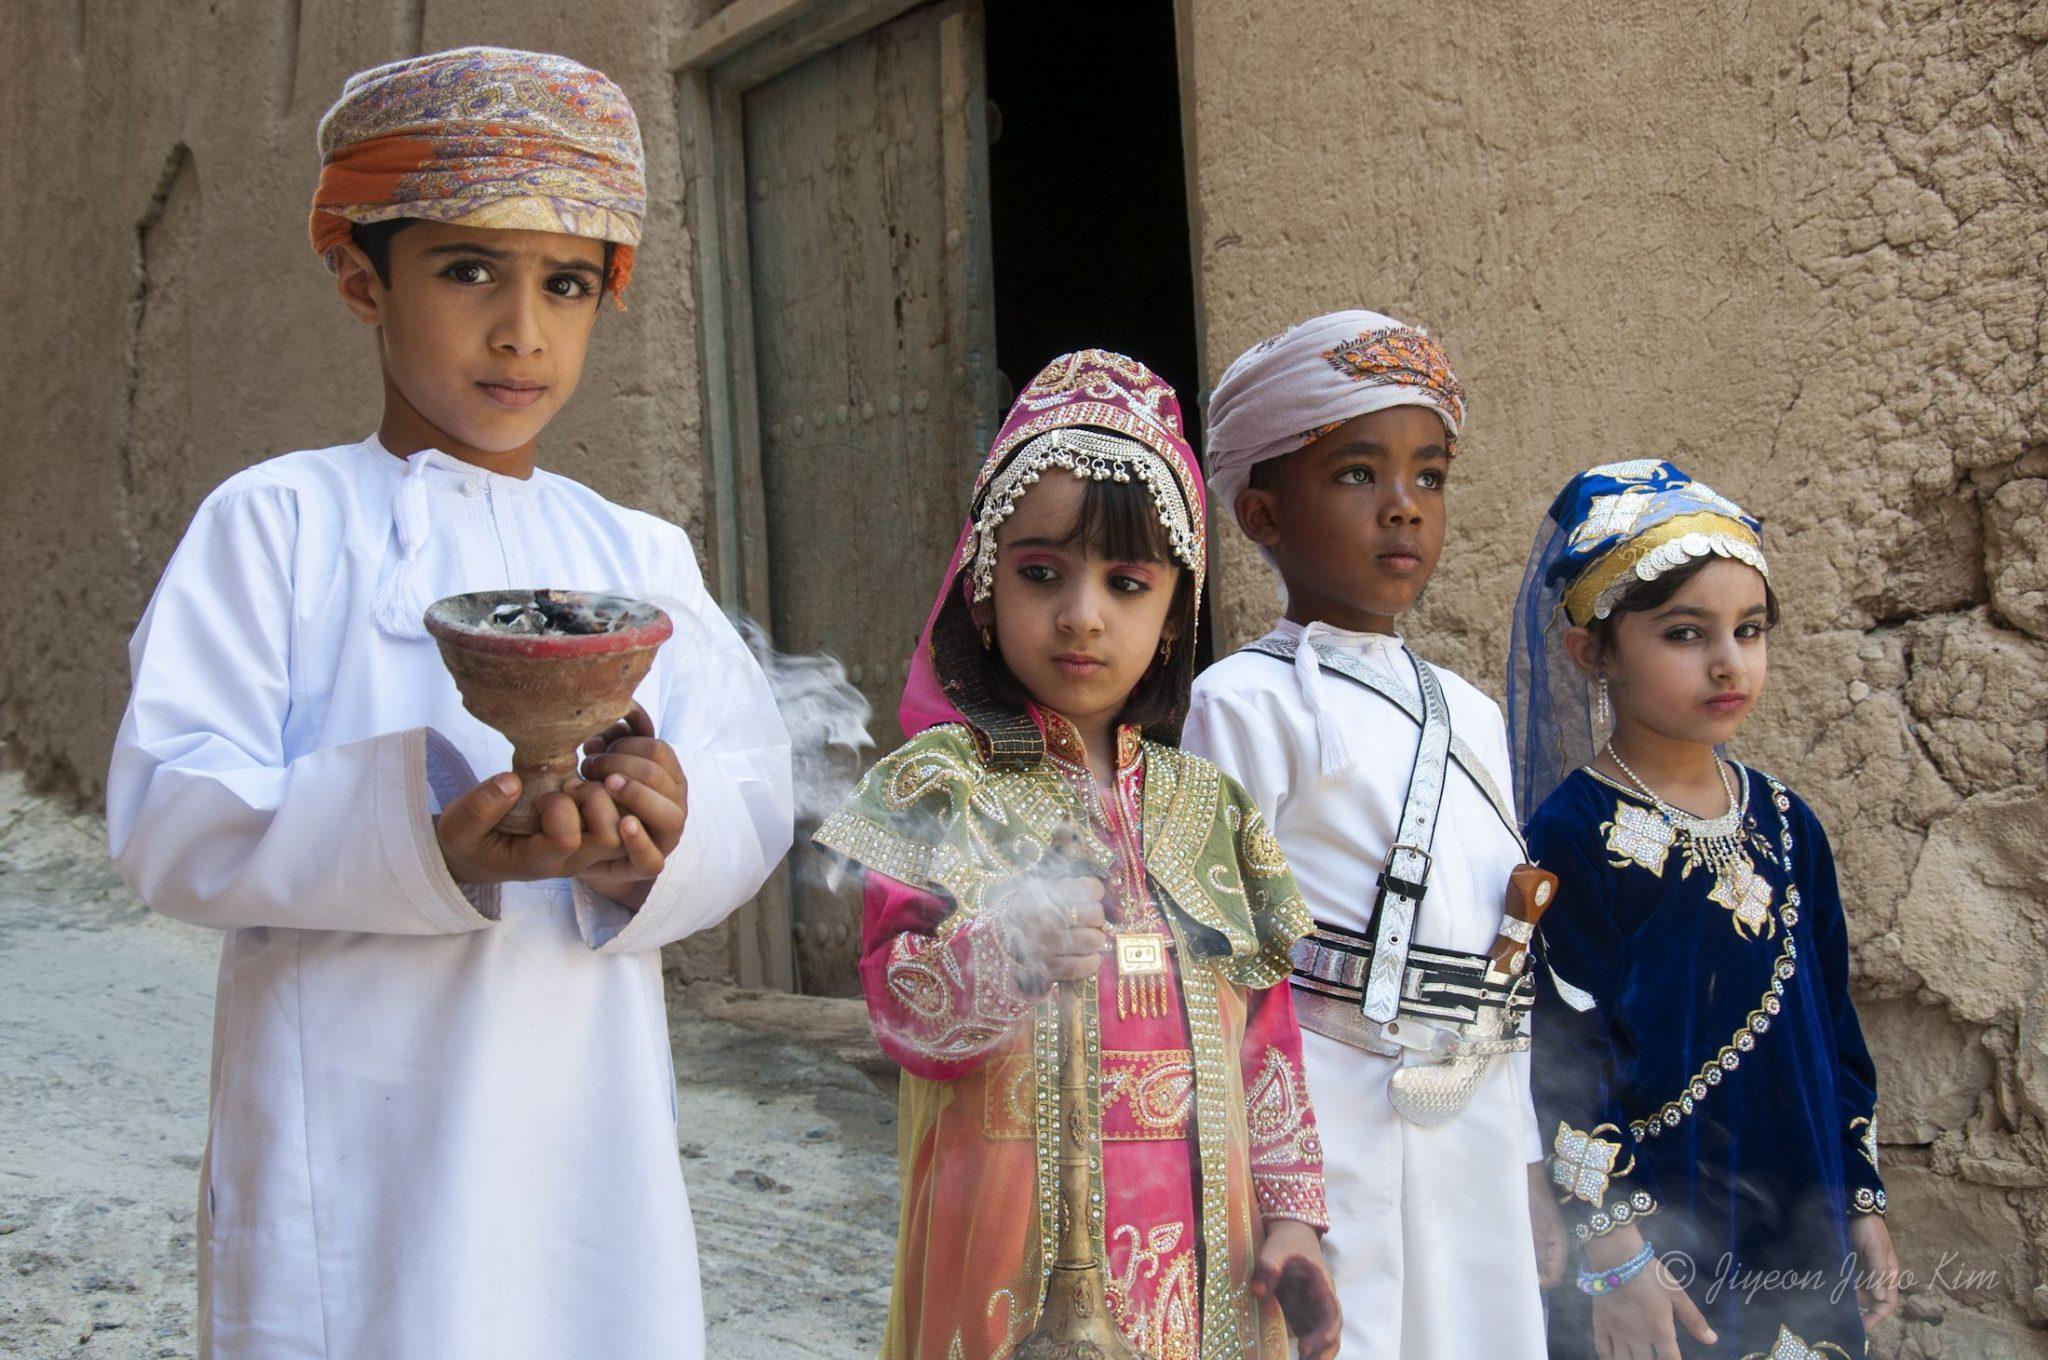 Children in Bait al Safah